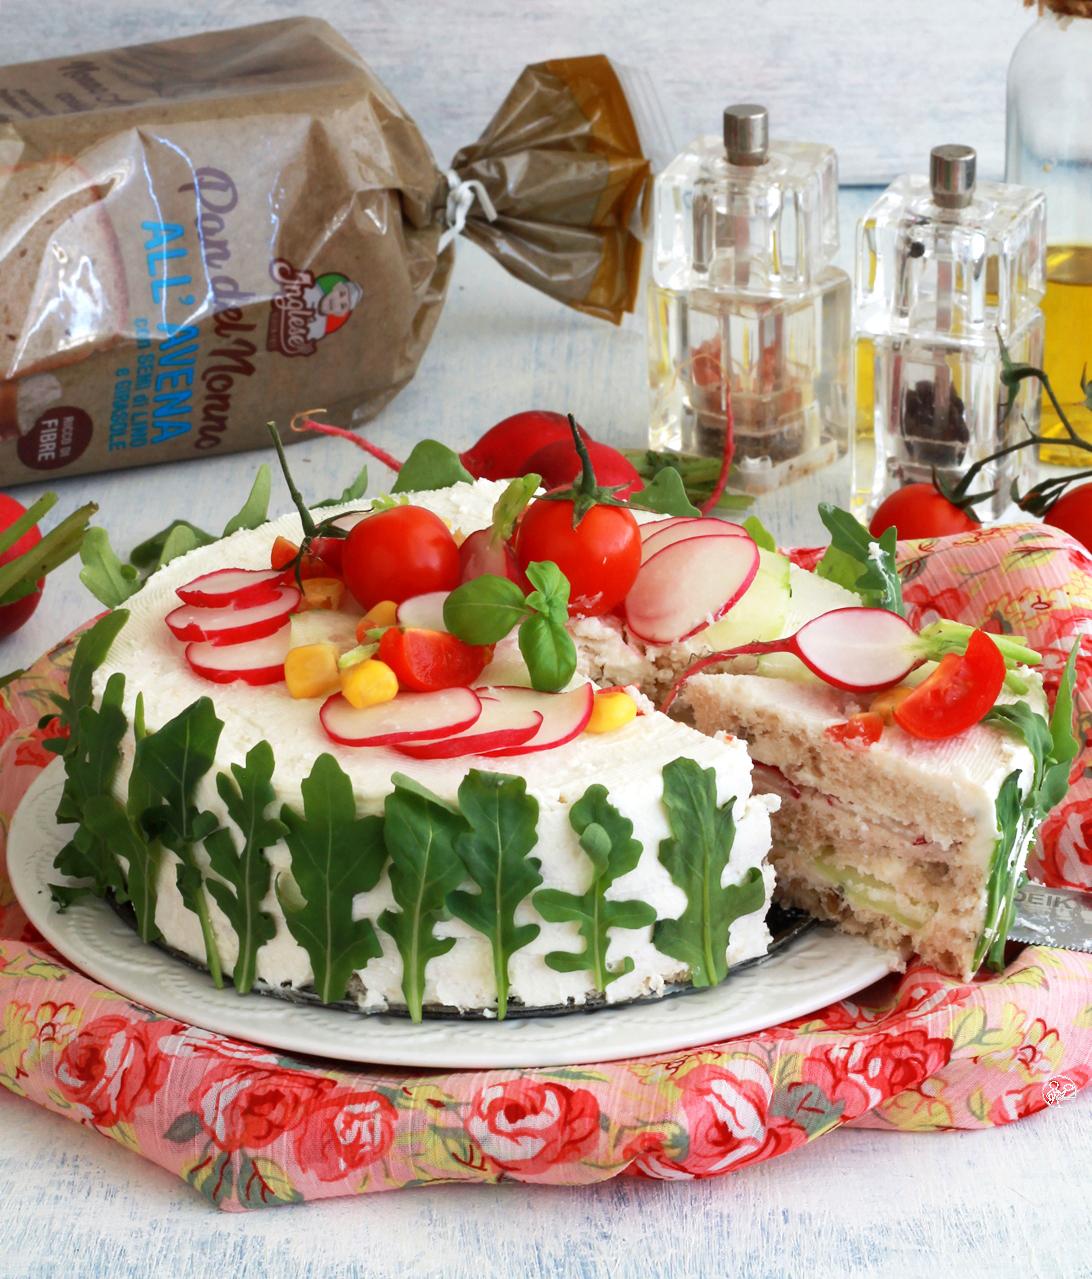 Sandwich cake senza glutine - La Cassata Celiaca